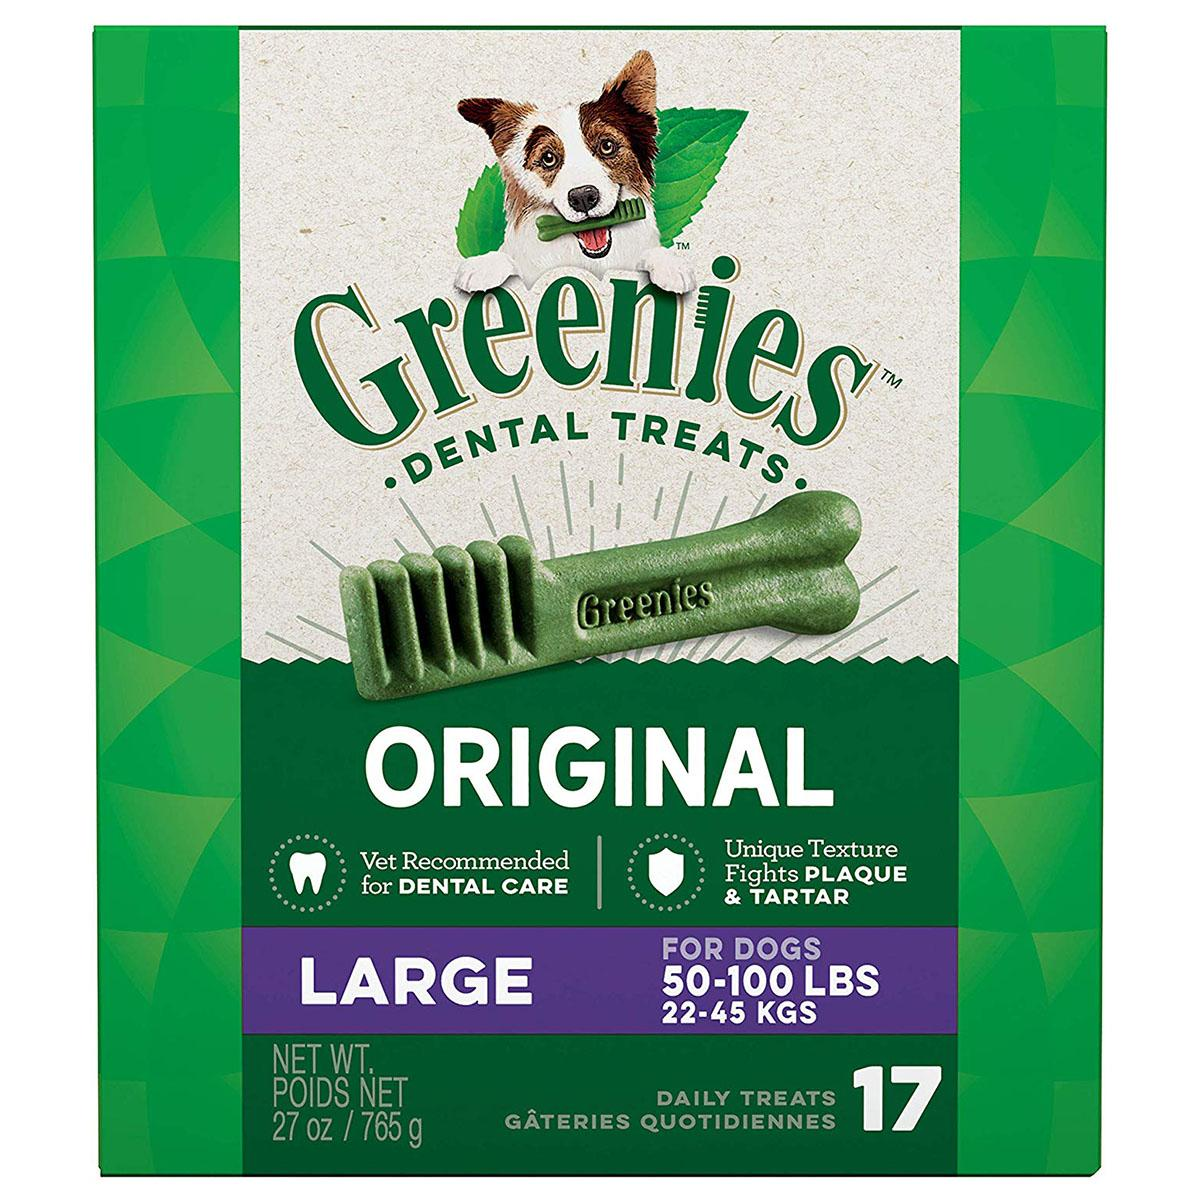 Greenies Original Dental Dog Chews - Large Dog Size